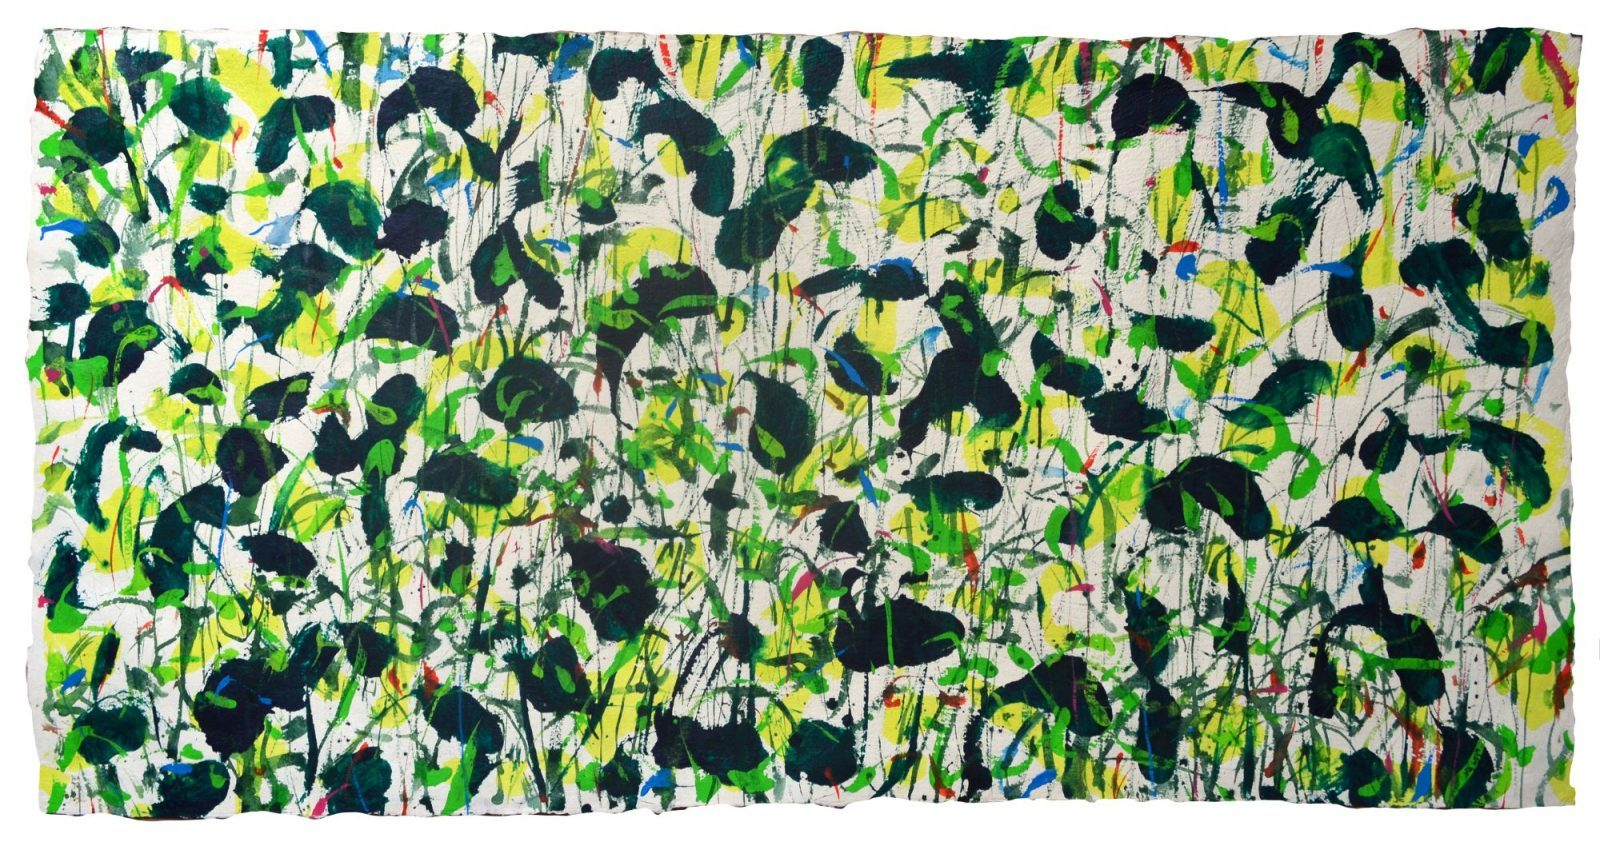 franyo aatoth: Garden Series 4.